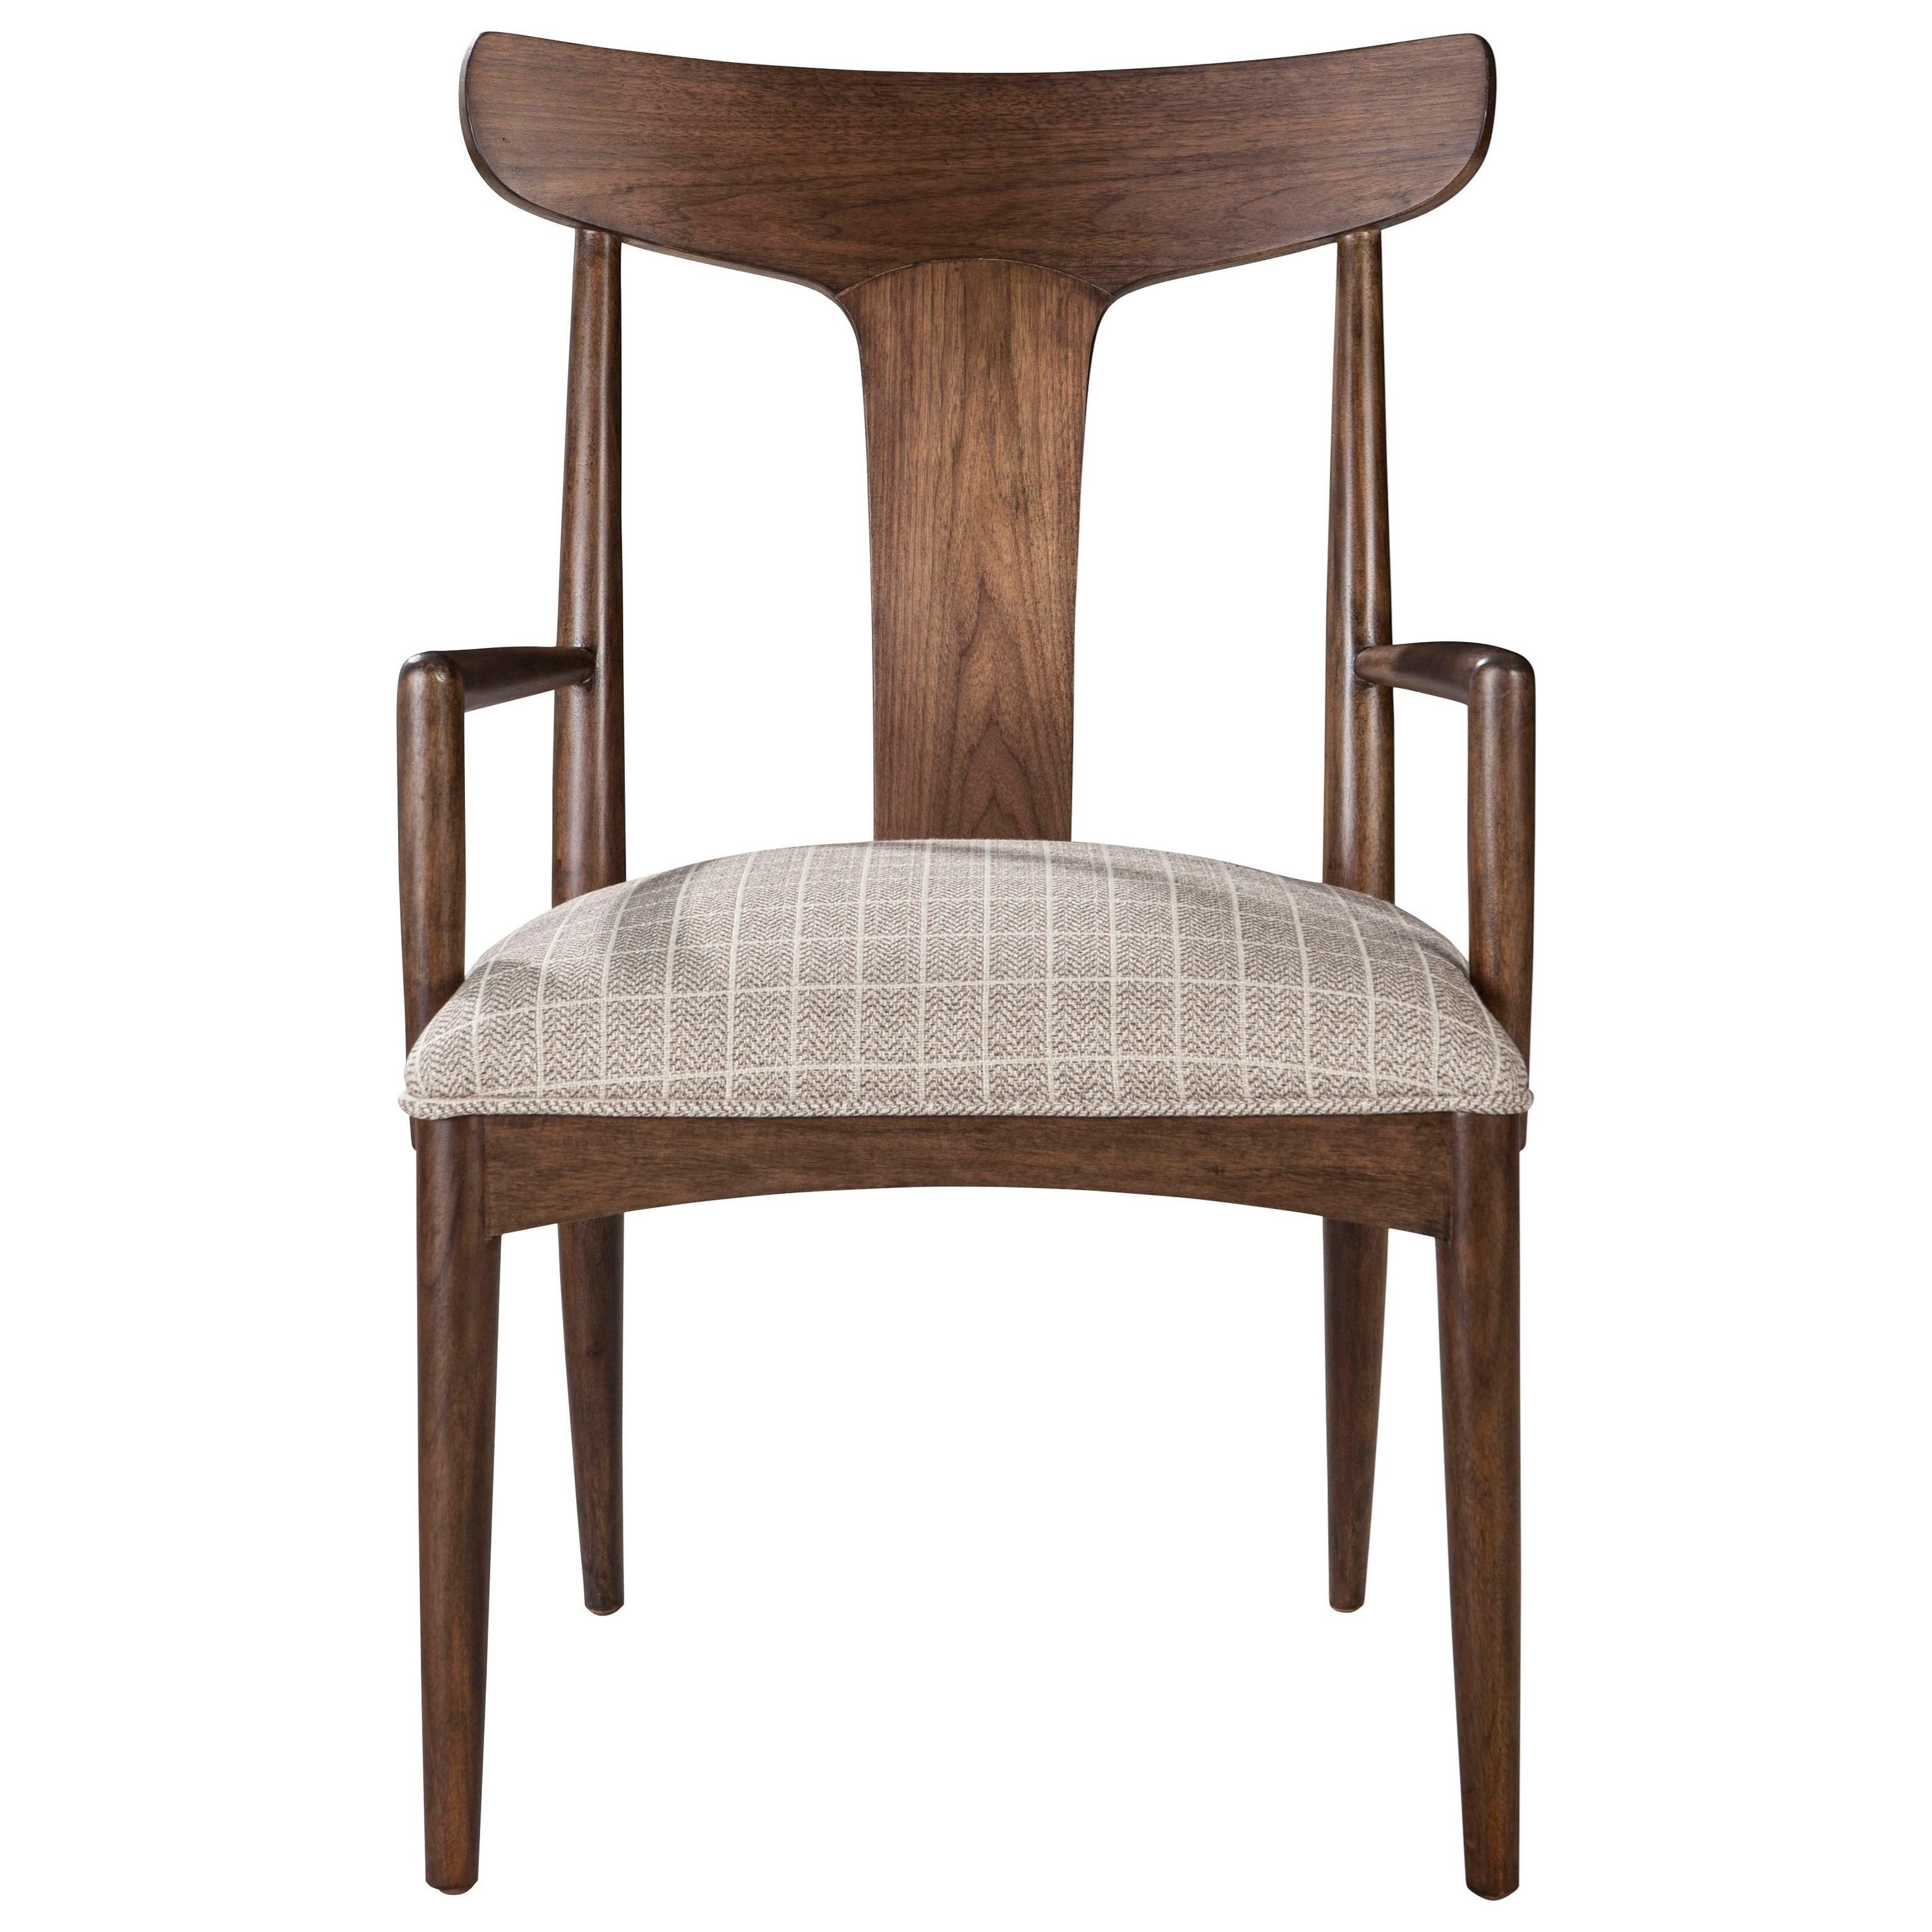 ED Ellen DeGeneres Crafted by Thomasville Ellen DeGeneres Lania Arm Chair - Item Number: 85821-822